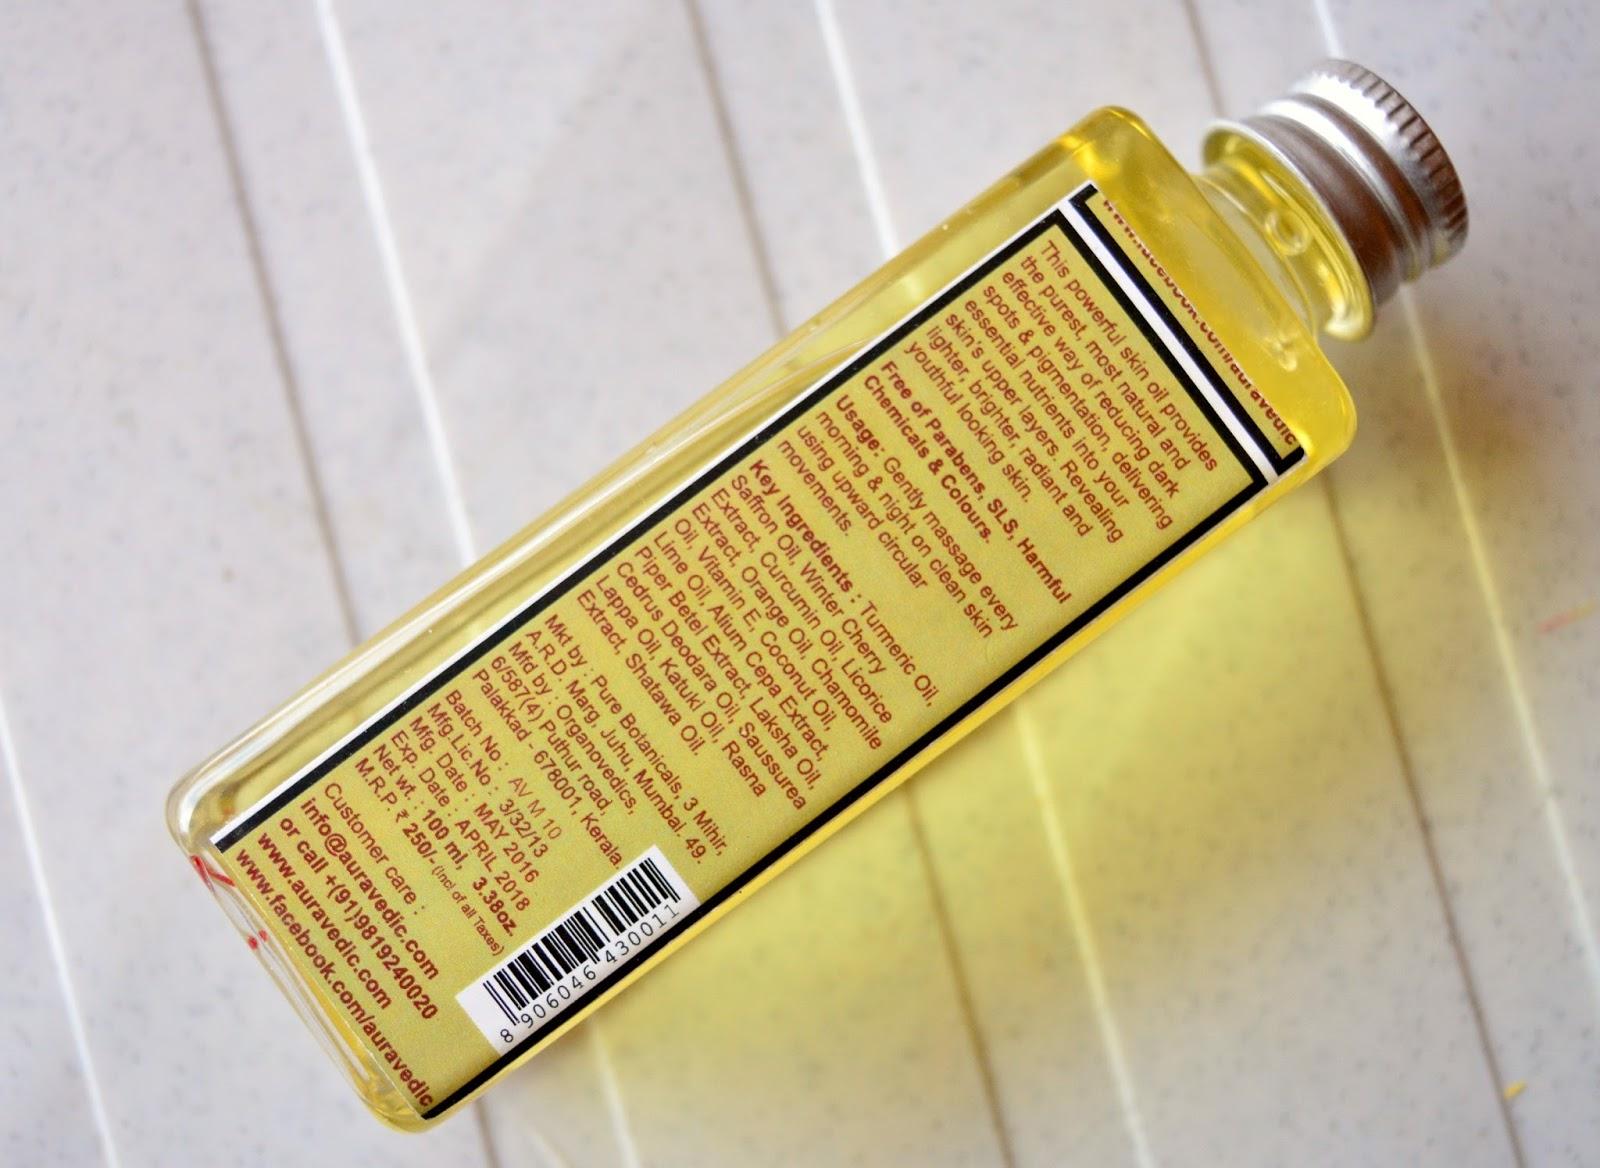 Auravedic Skin Lightening Oil Review